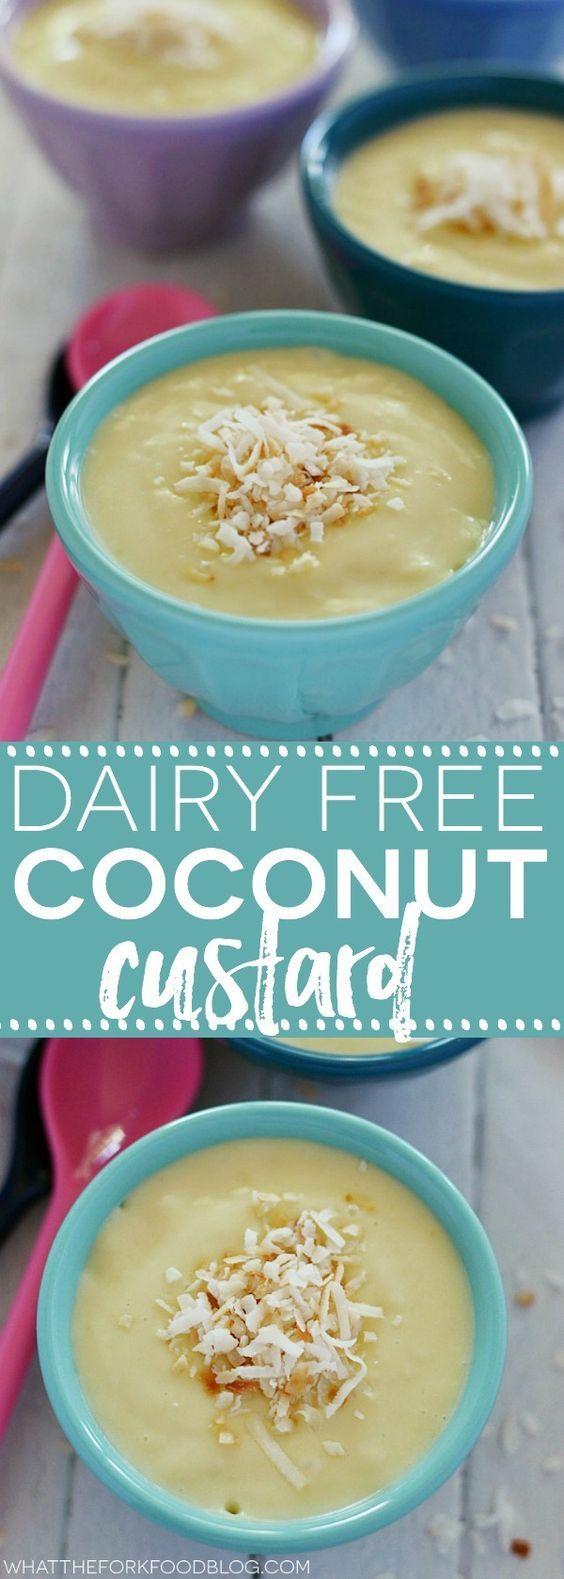 Dairy Free Coconut Custard